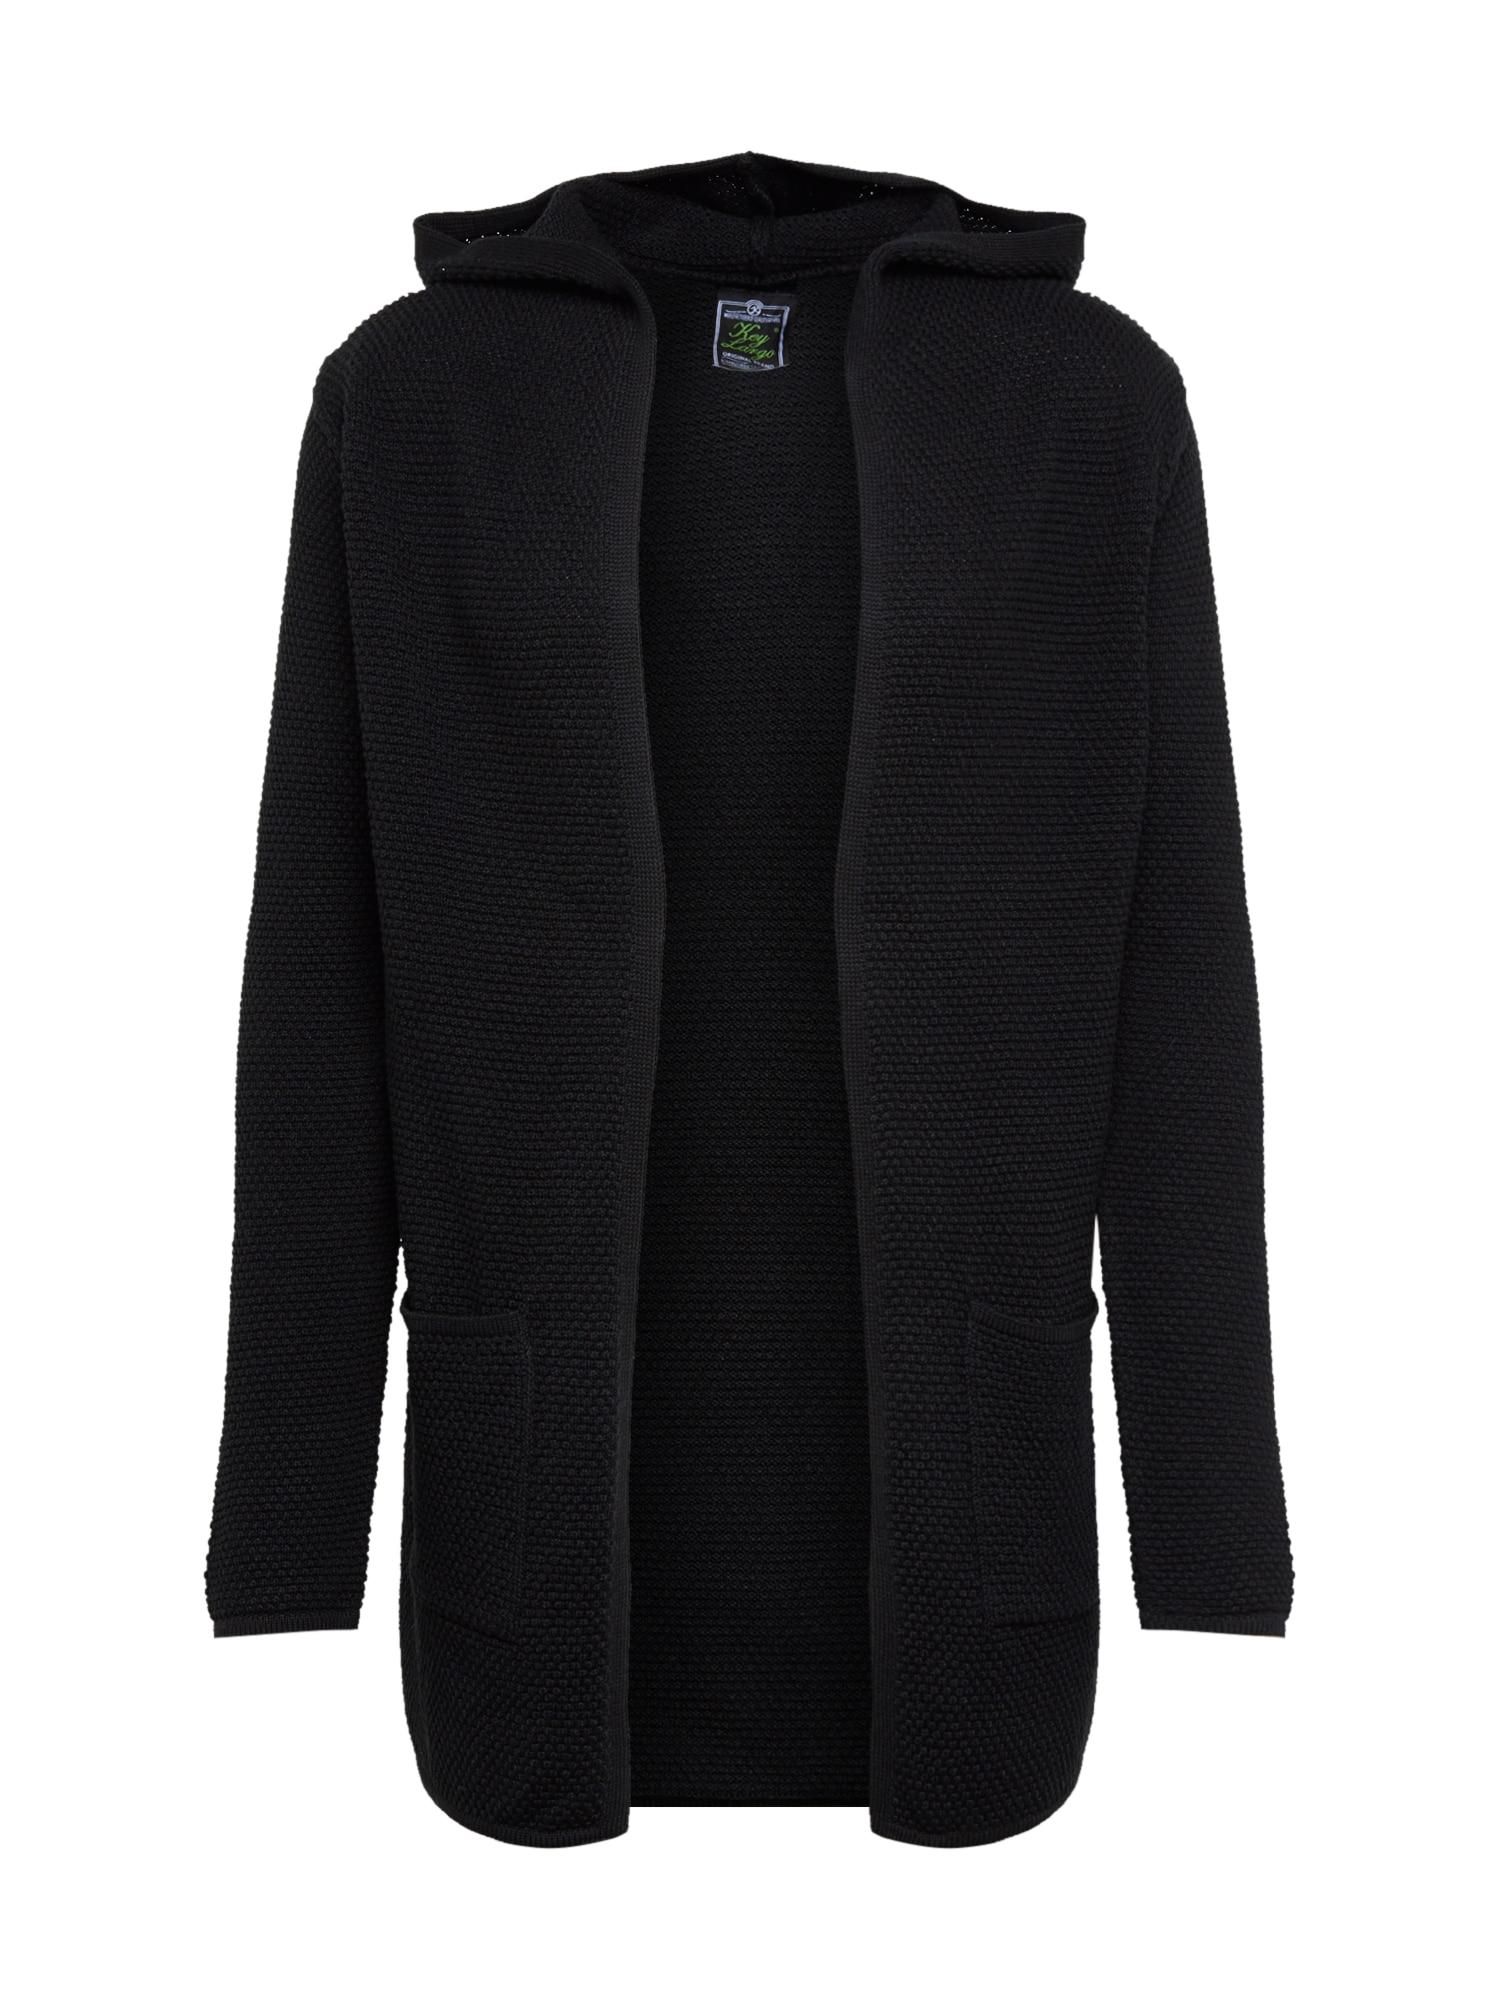 Key Largo Kardiganas 'MST TRANSFORMER jacket' juoda